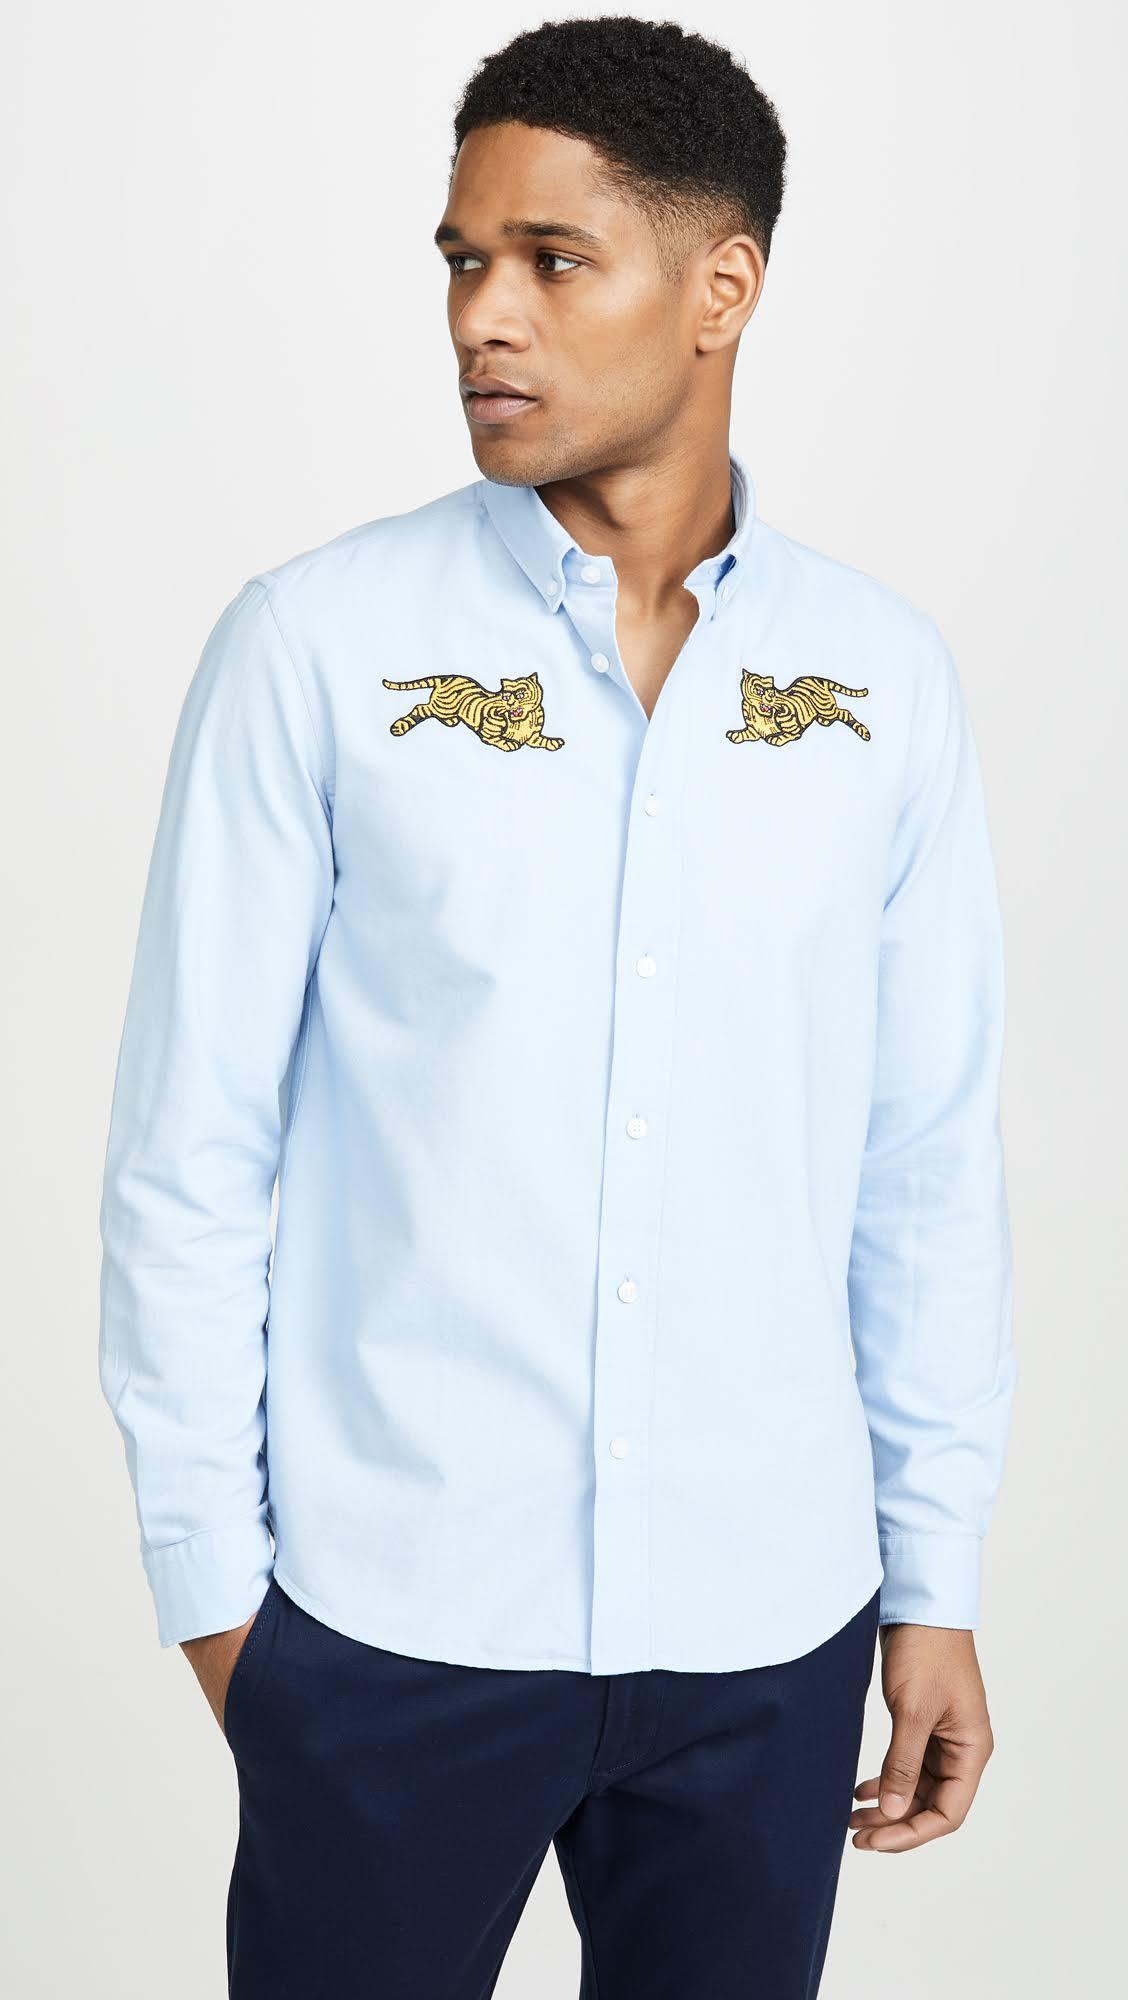 Xl Crest Camisa Jumping Informal Claro Kenzo Azul De Tiger Vestir vPFEwxz